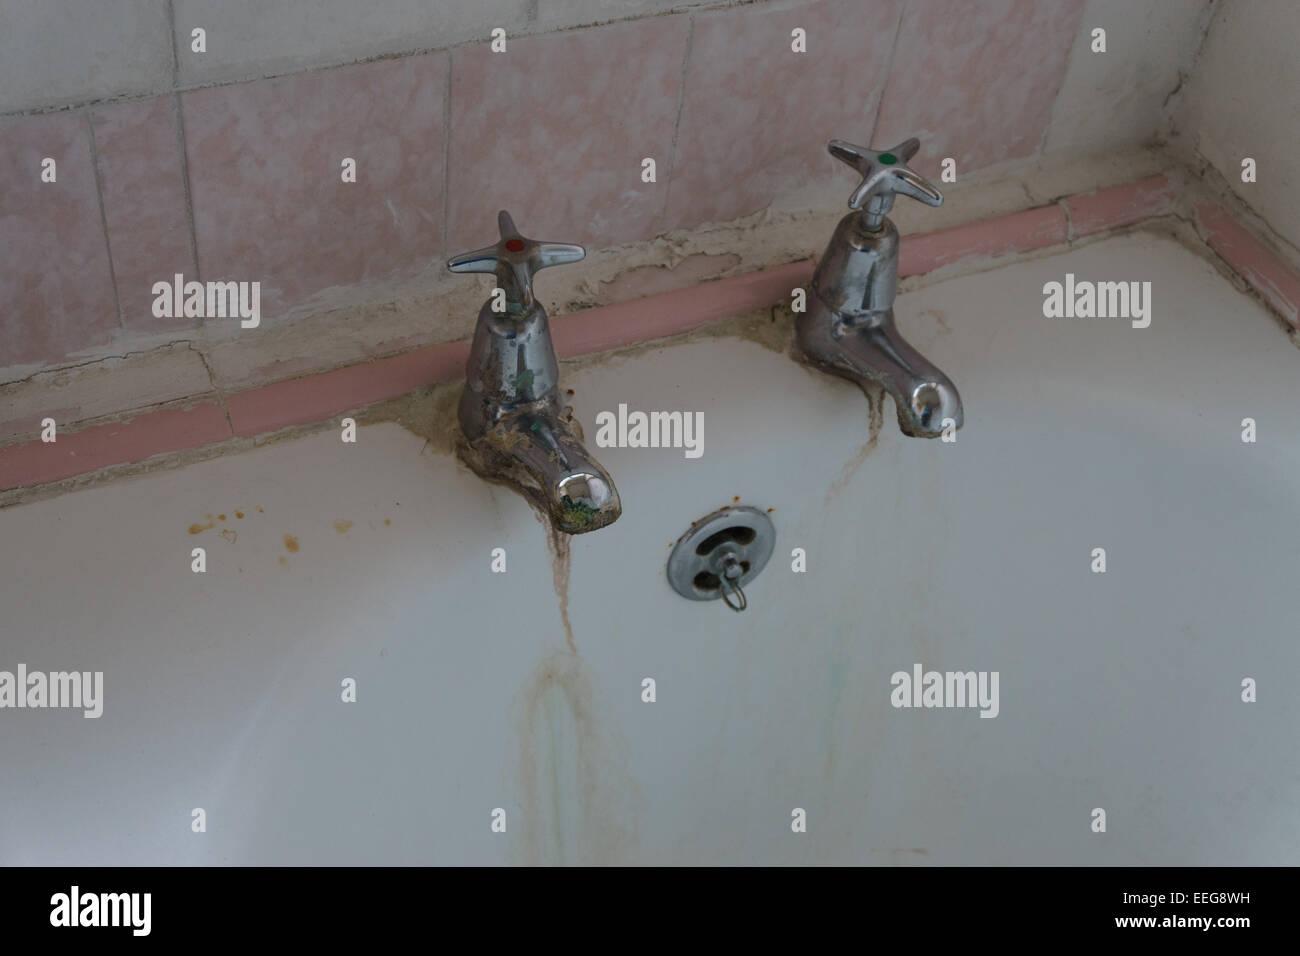 Bath Vasca Da Bagno In Inglese : Bath taps immagini & bath taps fotos stock alamy